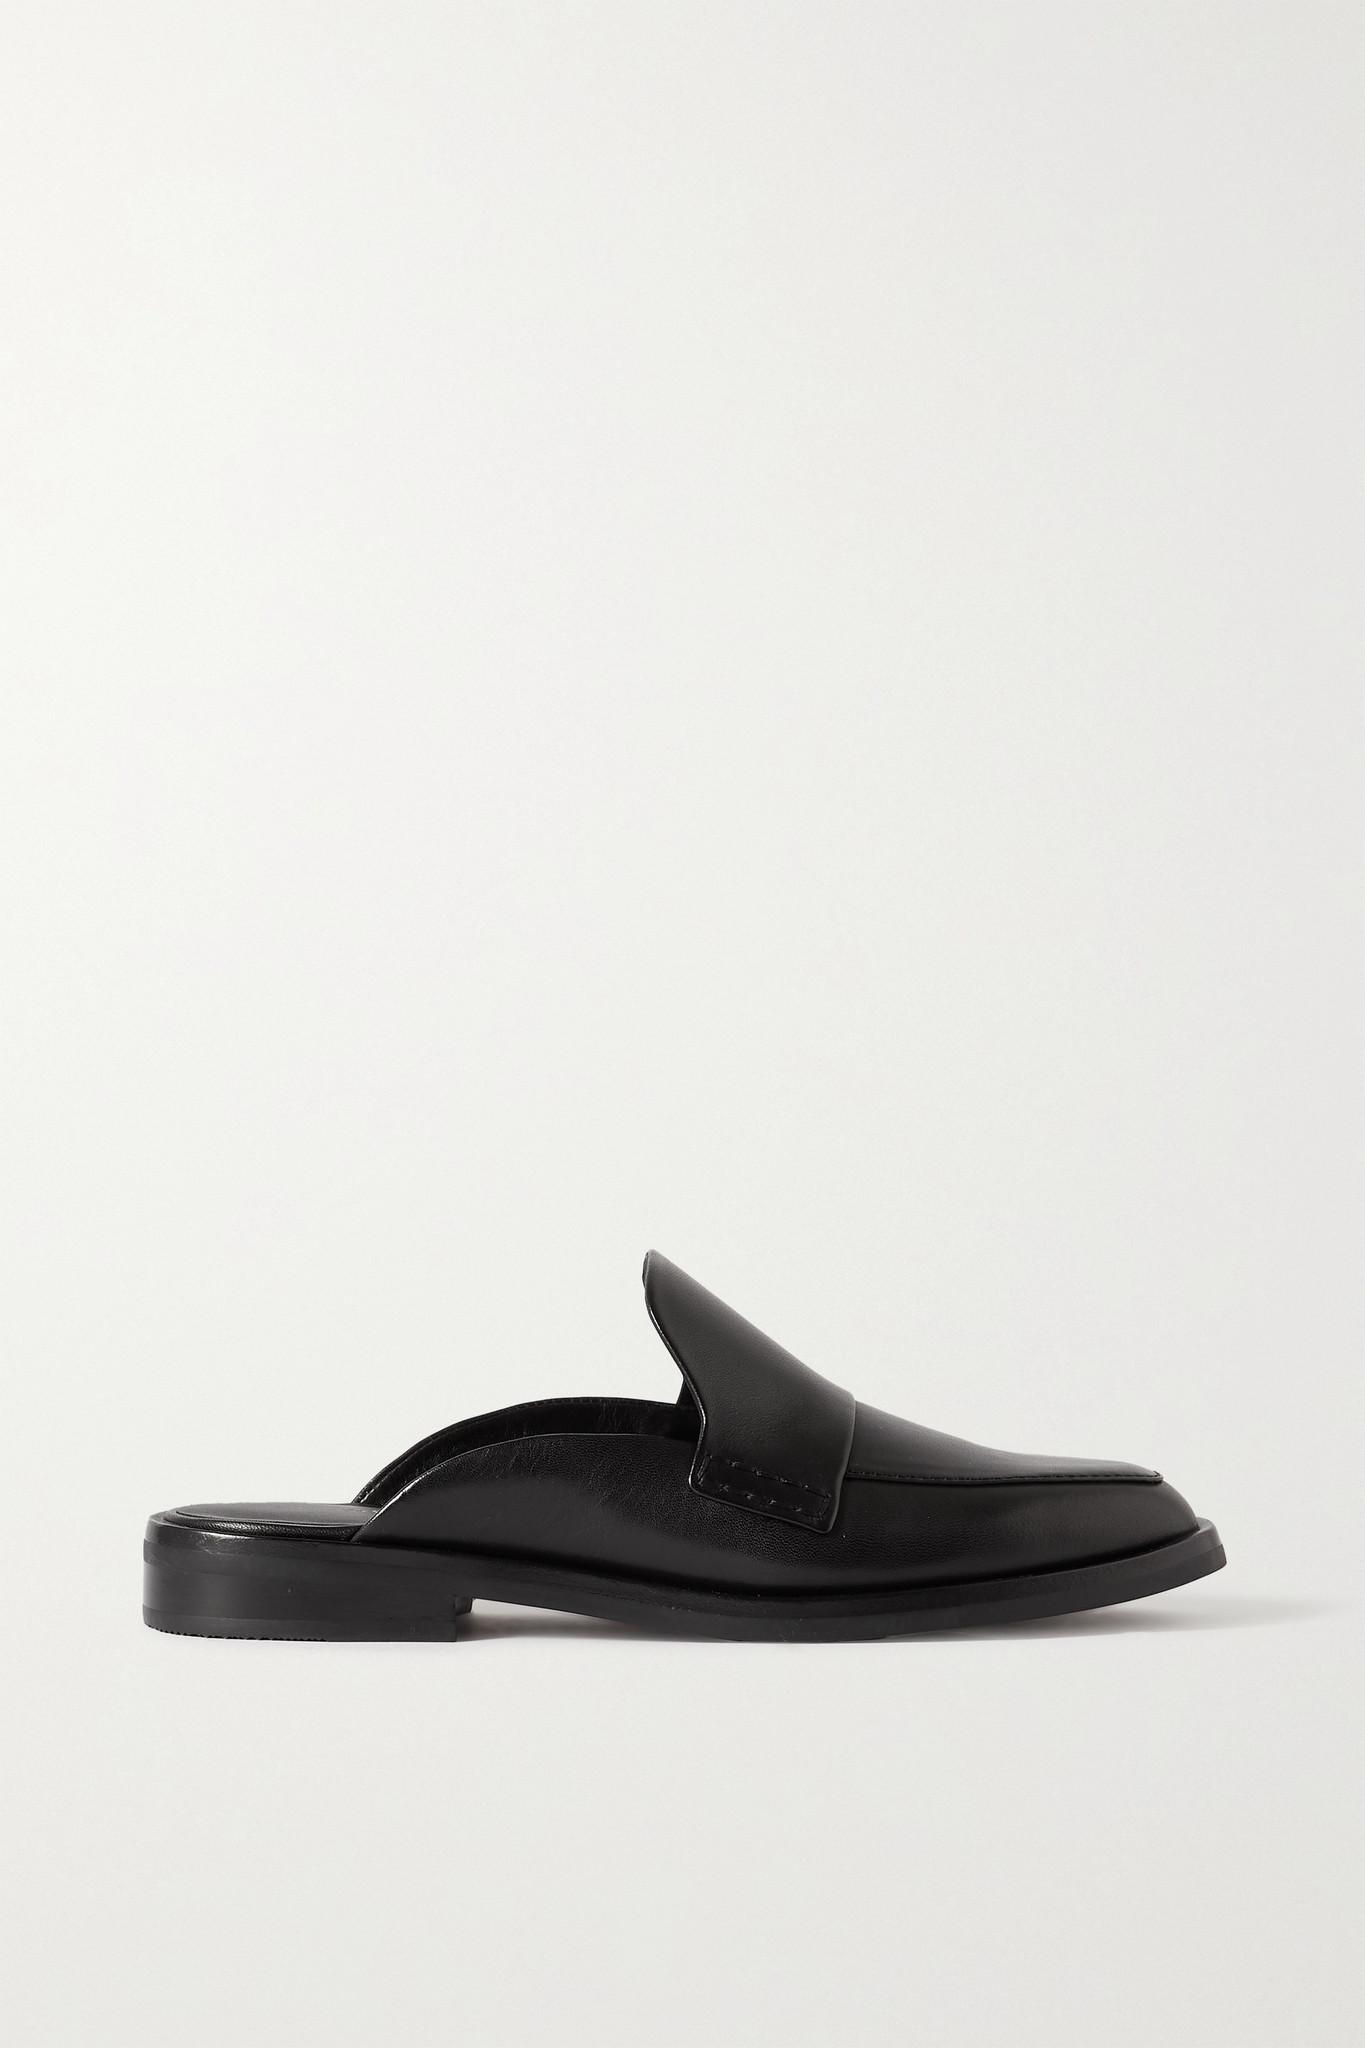 3.1 PHILLIP LIM - Alexa Leather Slippers - Black - IT37.5